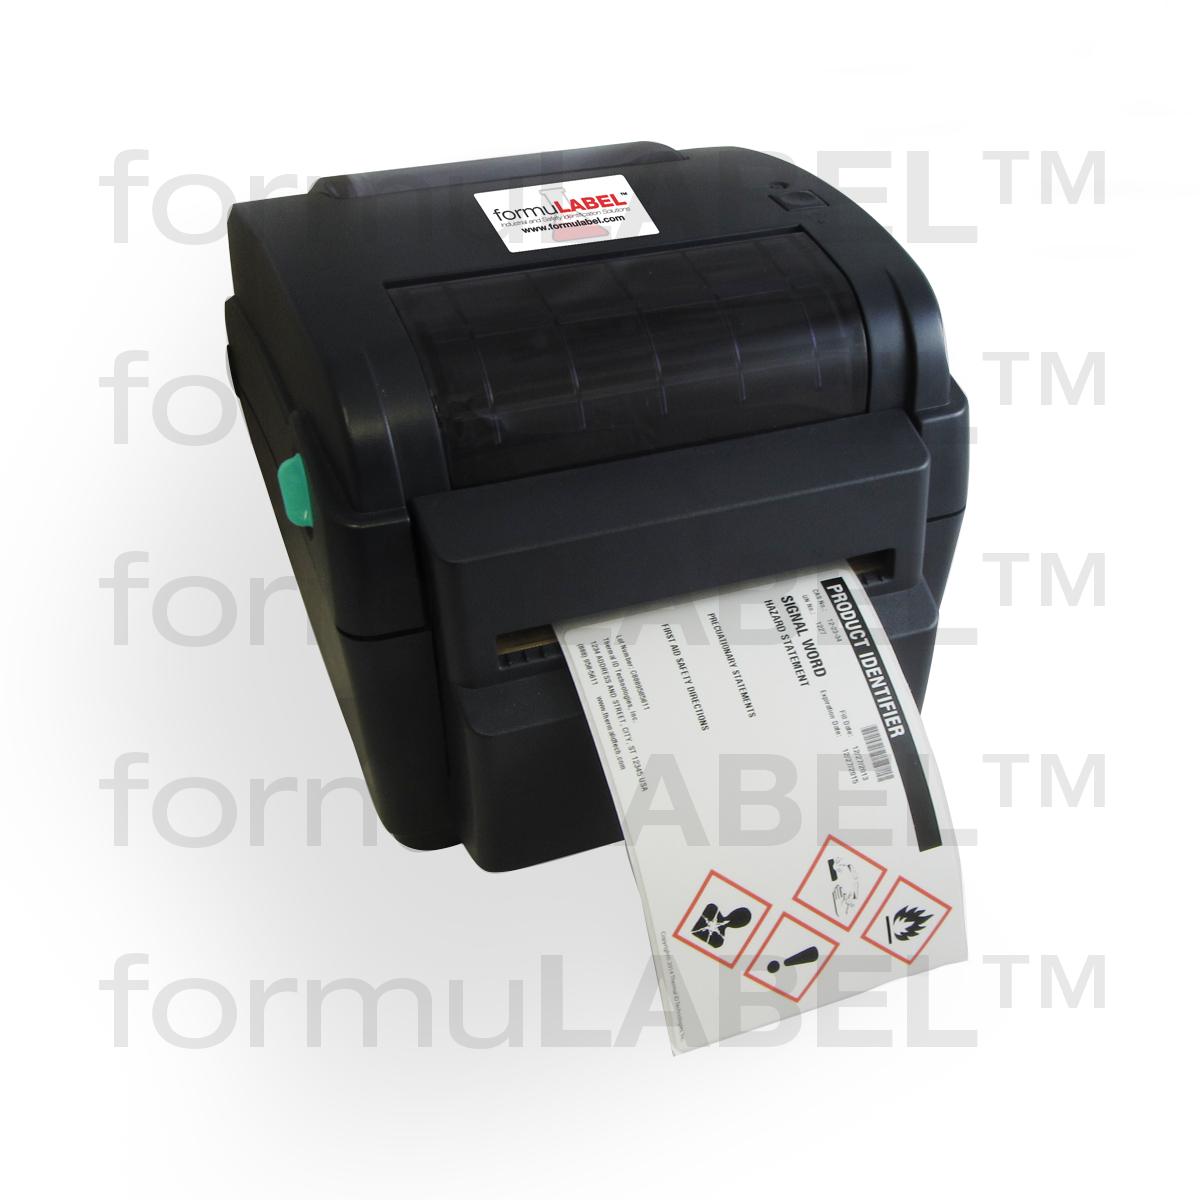 4C formuLABEL™ Industrial Label Printer